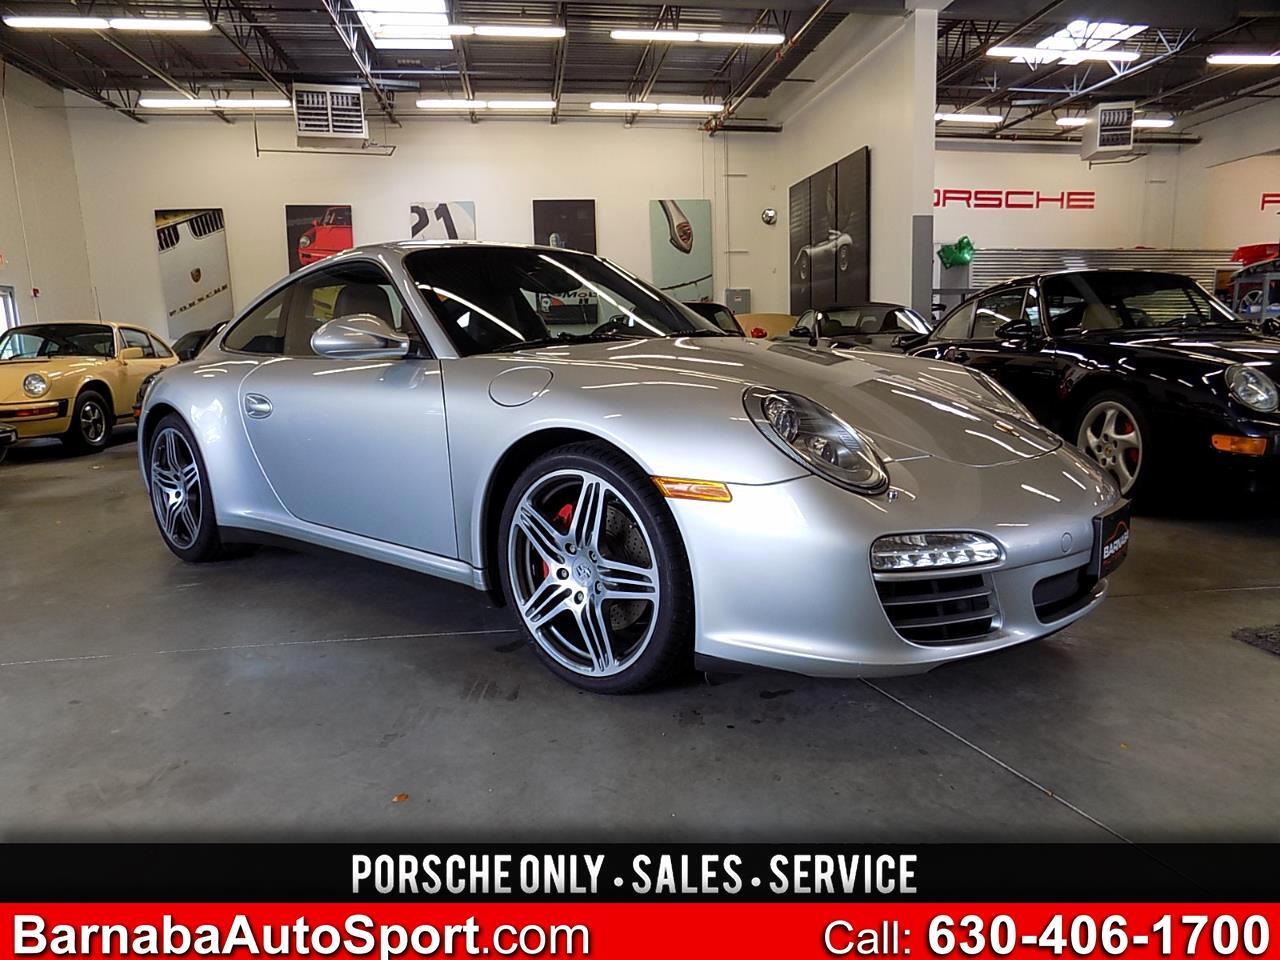 Porsche 911 Carrera 4S Coupe 2010